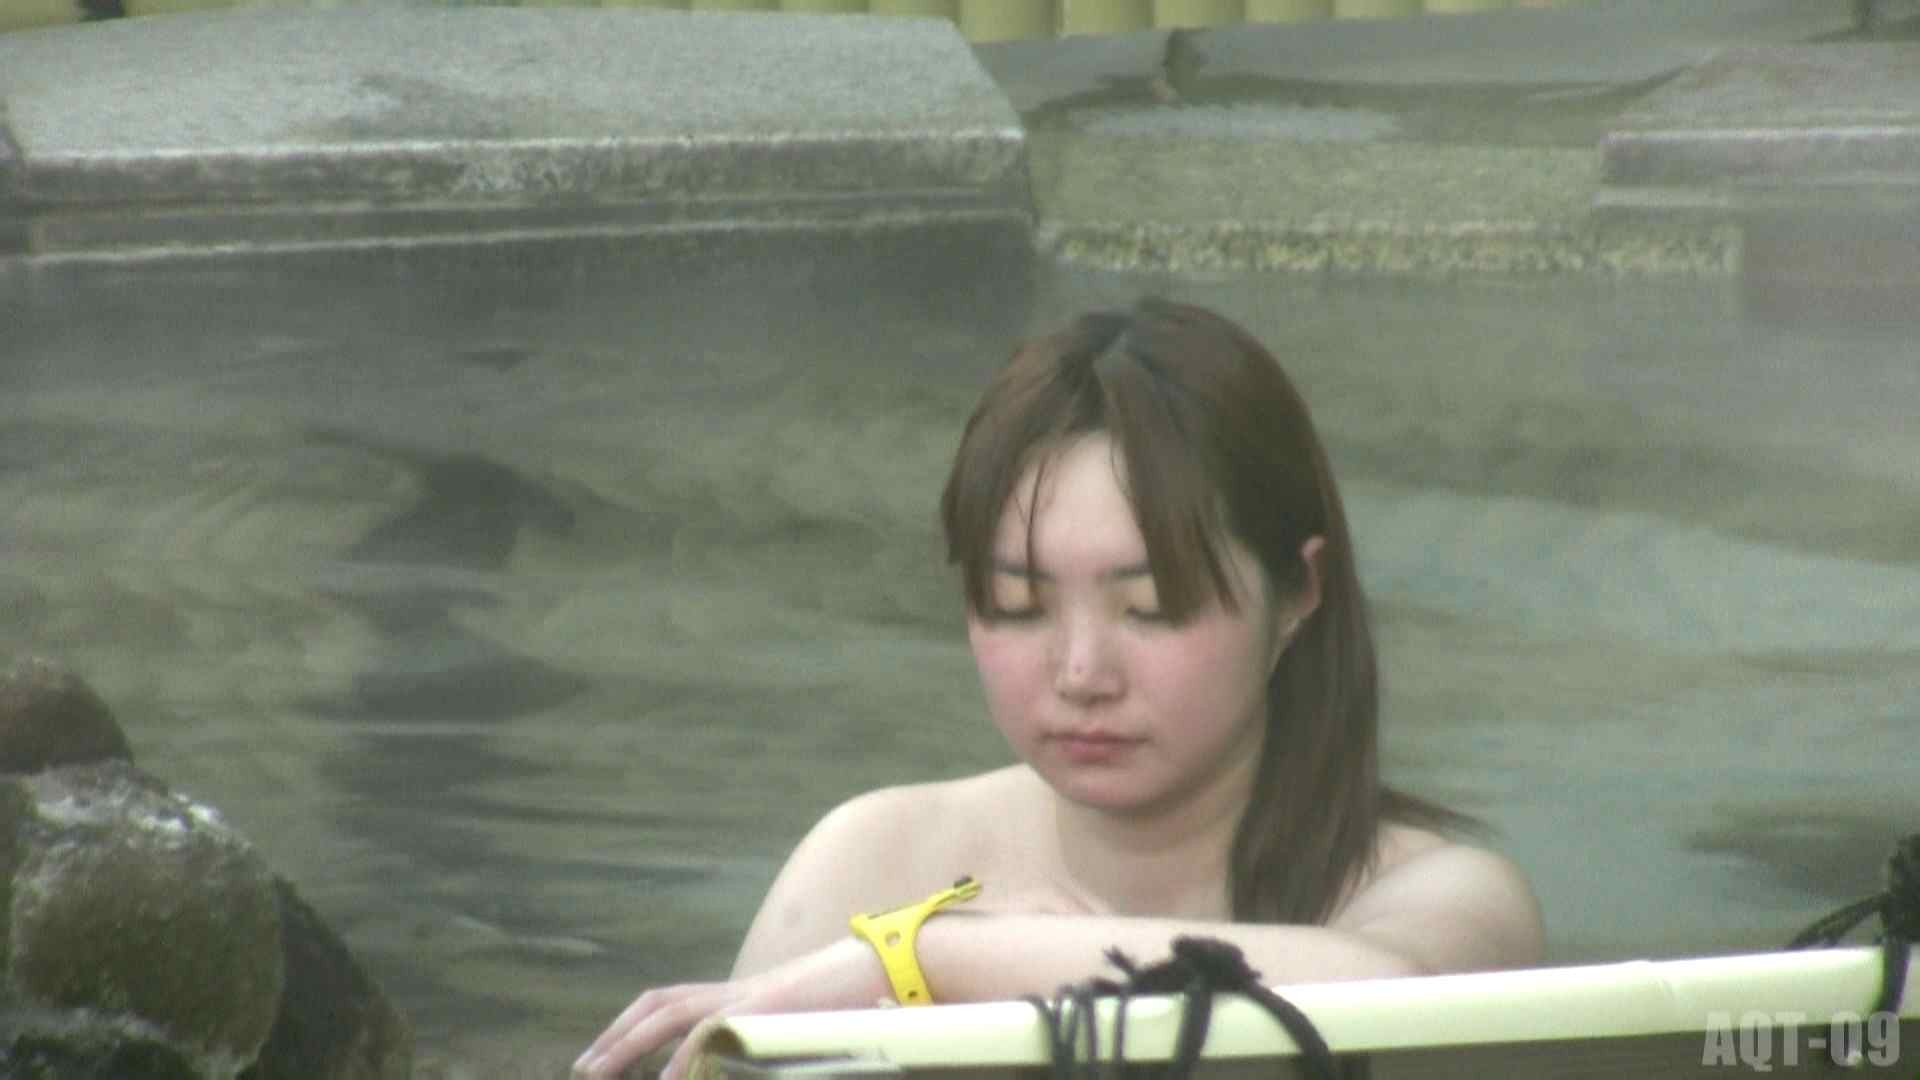 Aquaな露天風呂Vol.781 OLセックス 盗撮動画紹介 110画像 89